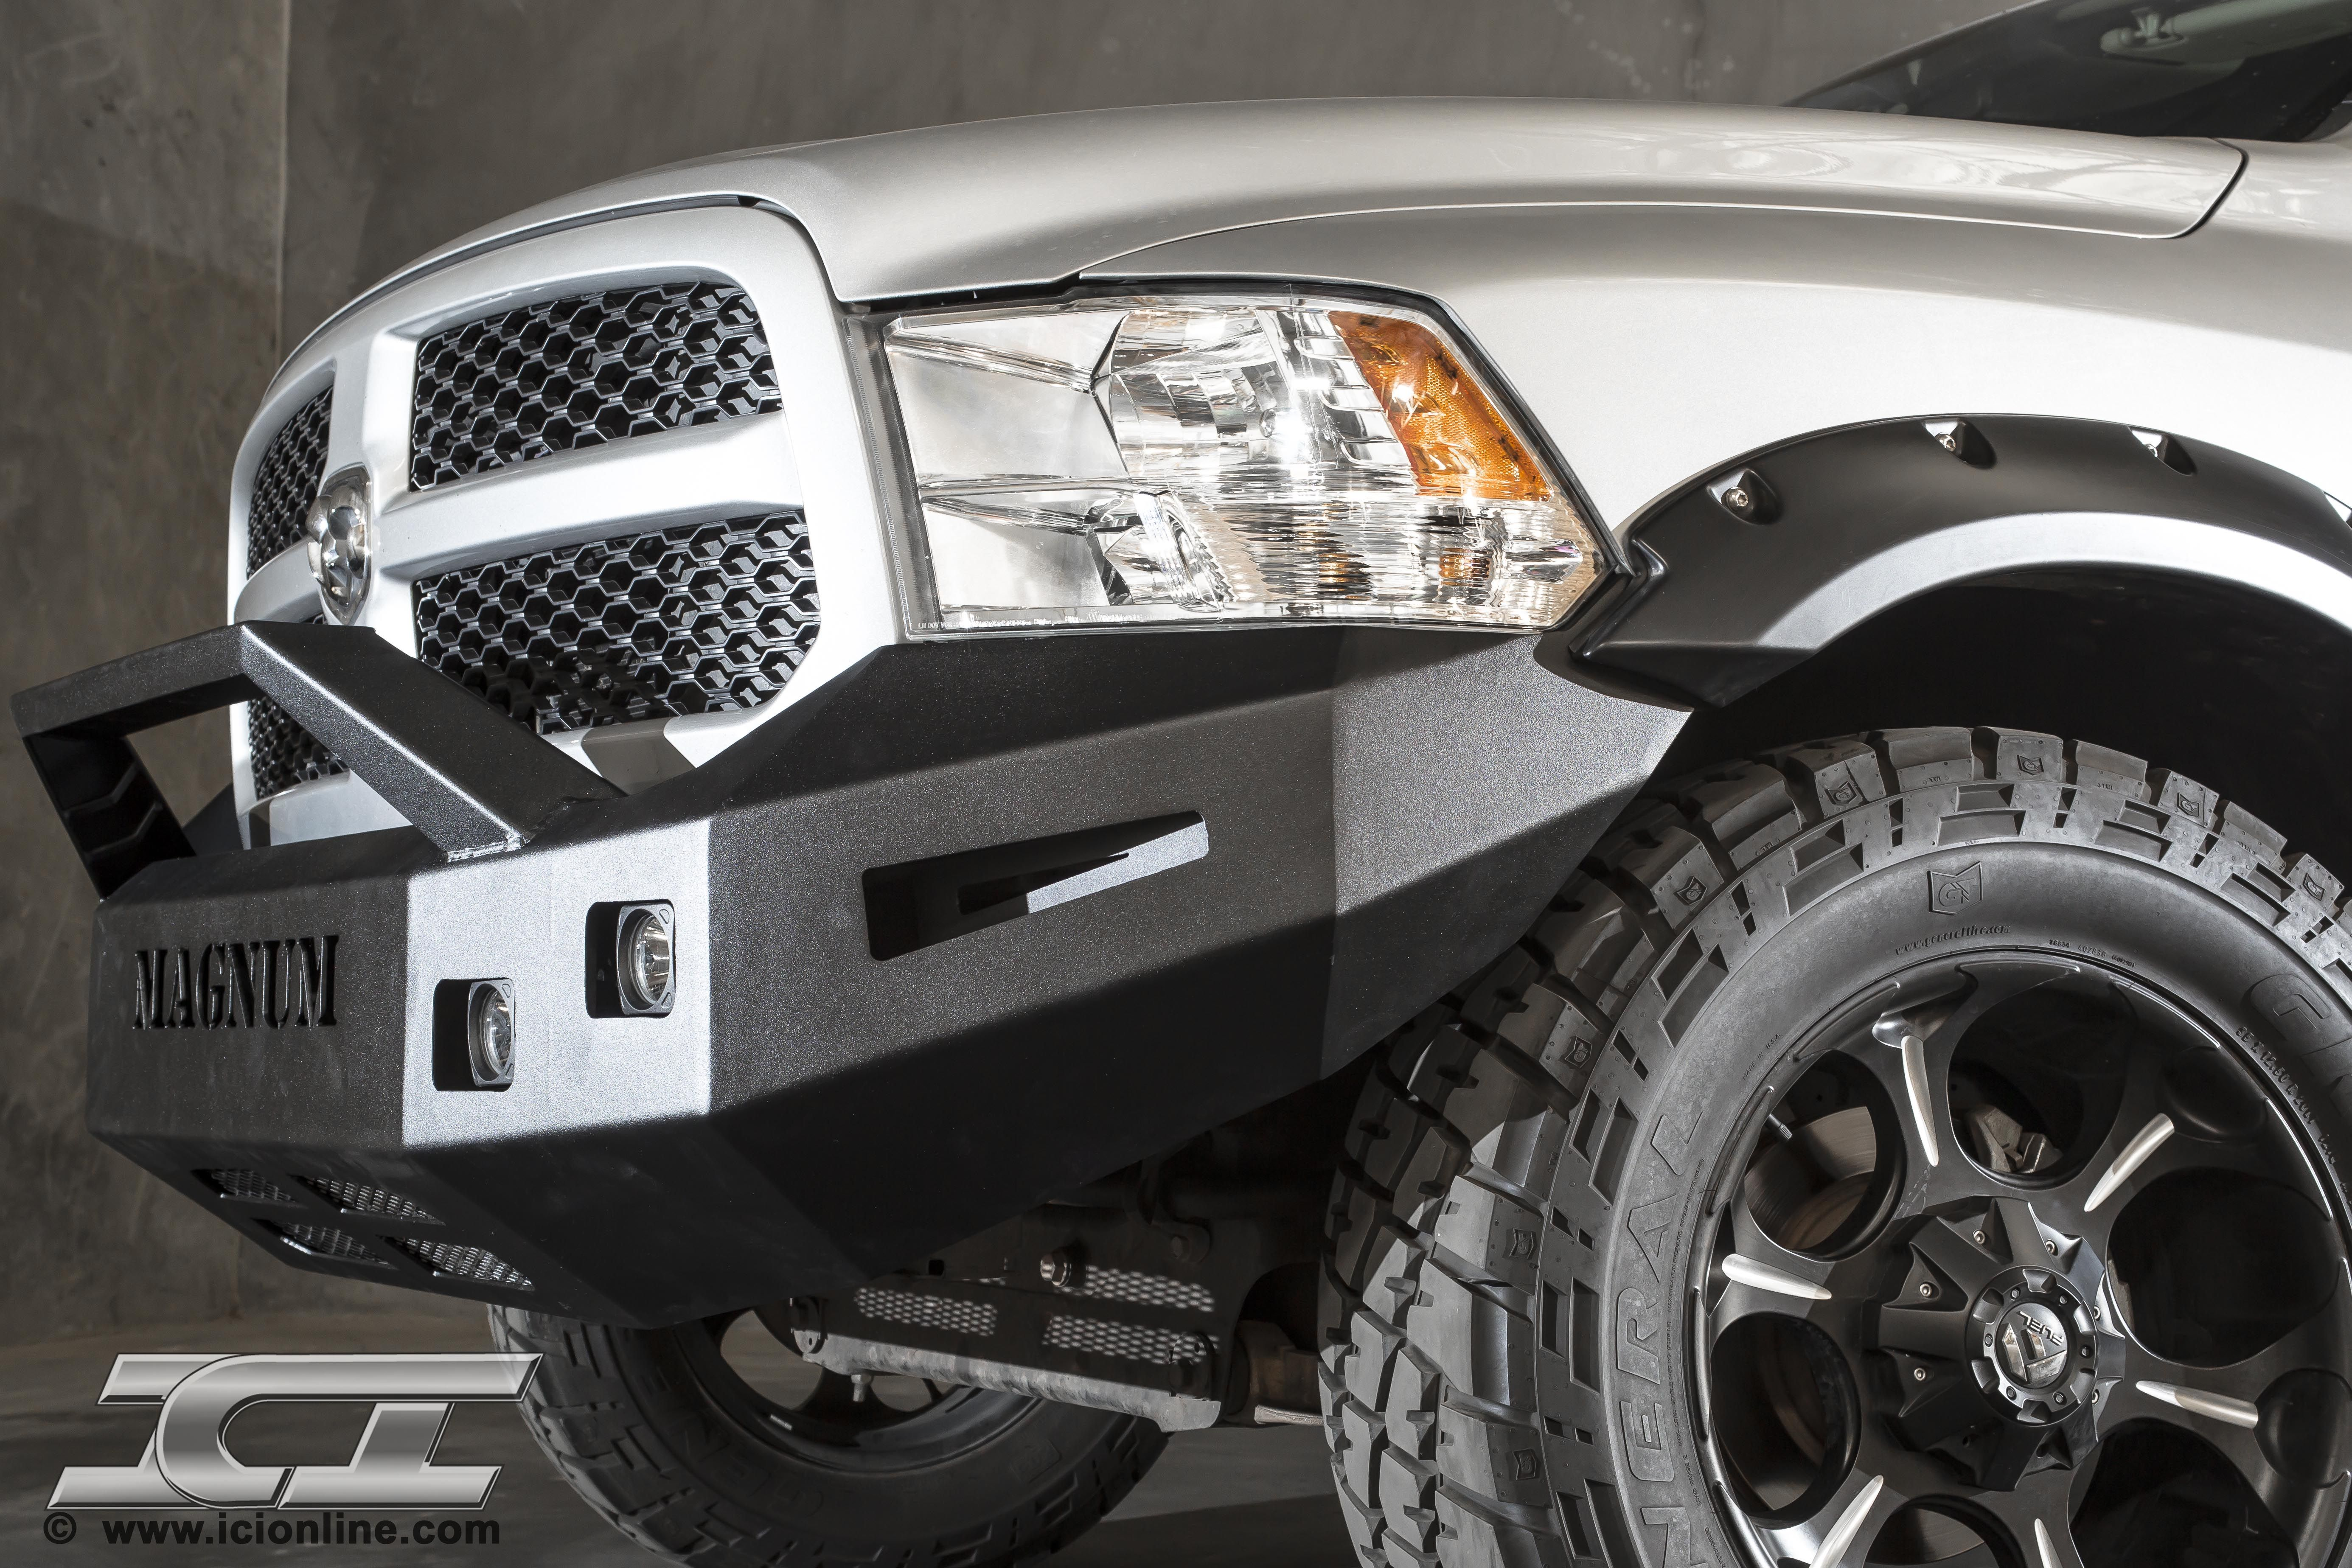 2014 dodge ram bumper - Front Magnum Bumper For 2009 2014 Dodge Ram 1500 Sport And Non Sport